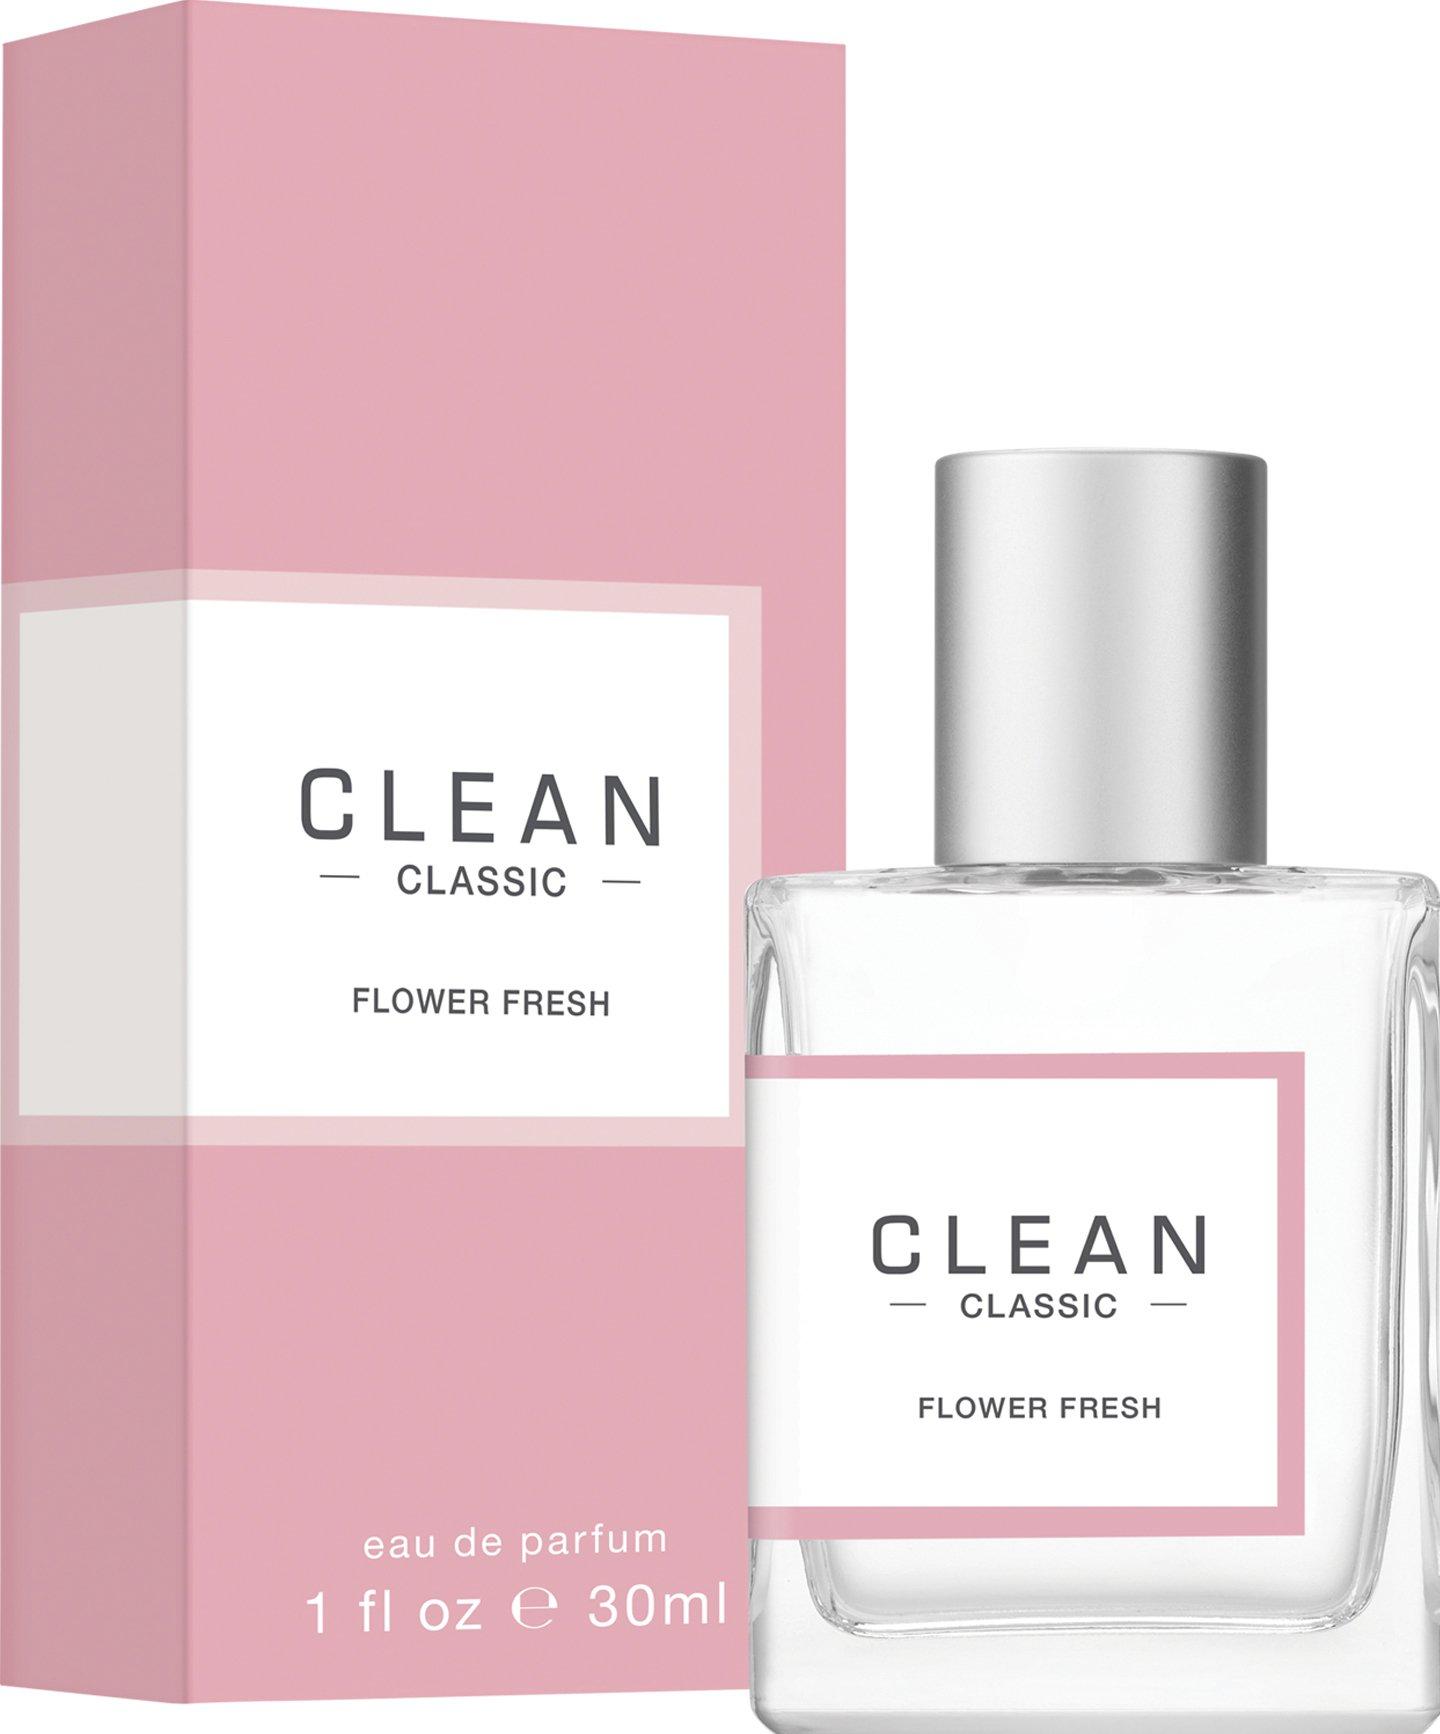 CLEAN PERFUME Flower Fresh Eau de Parfum